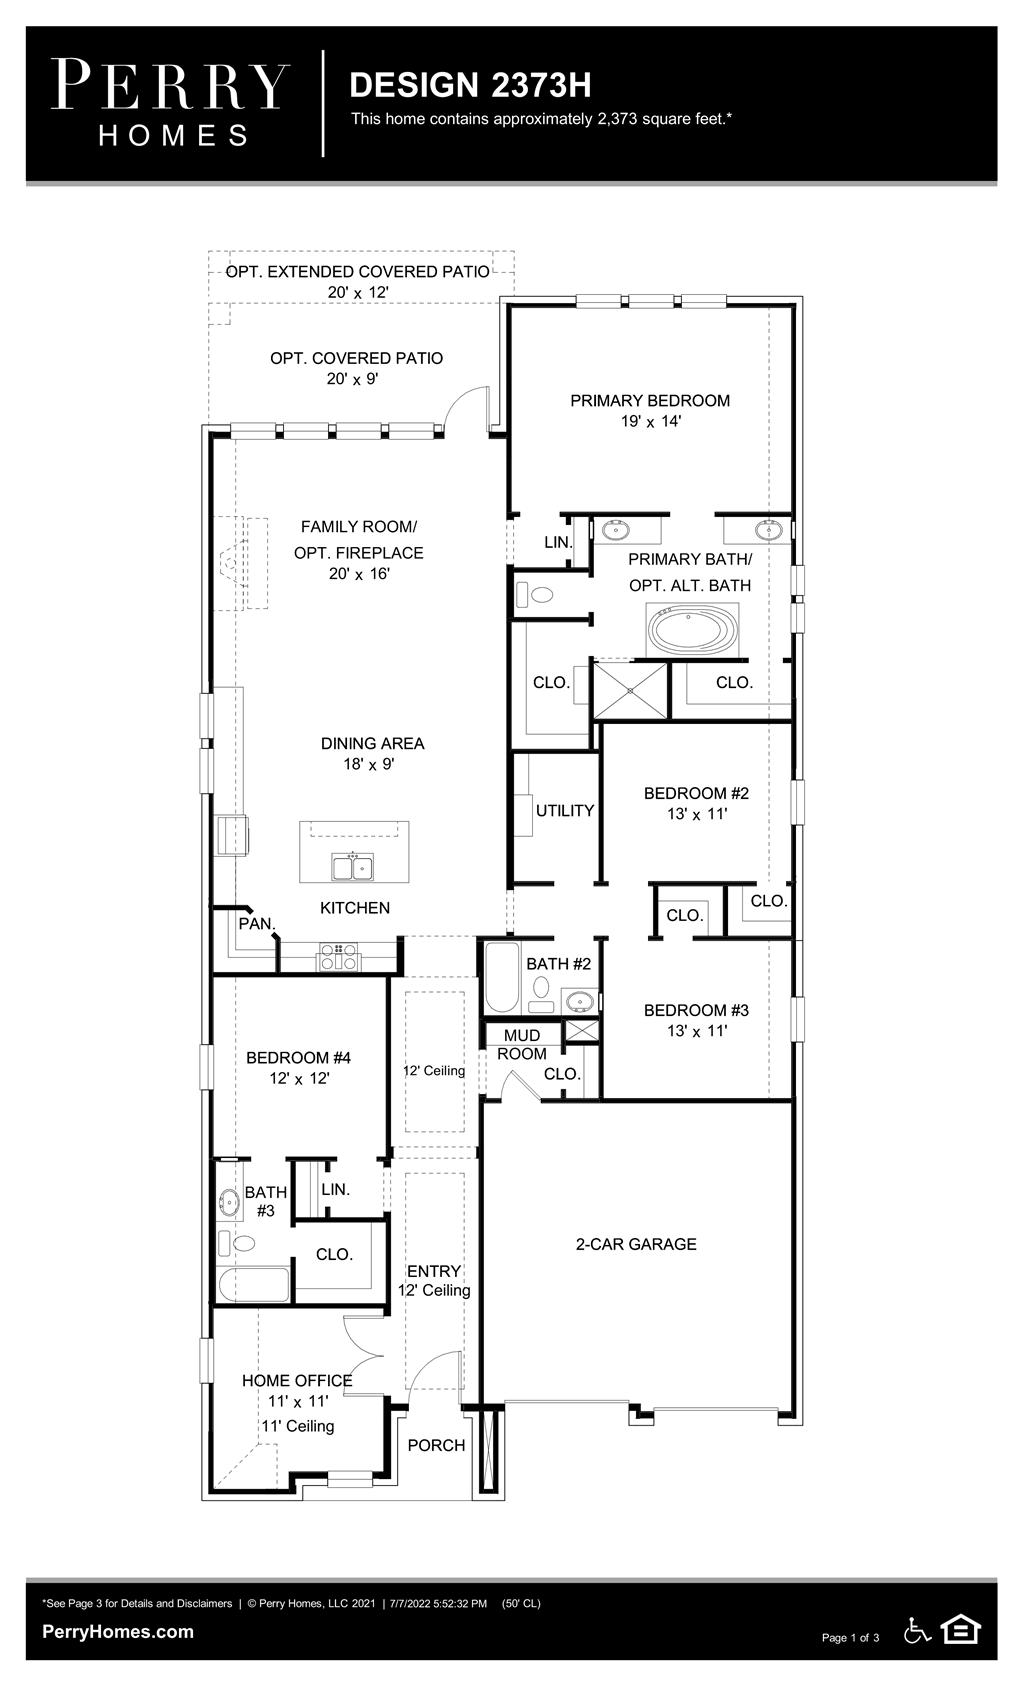 Floor Plan for 2373H